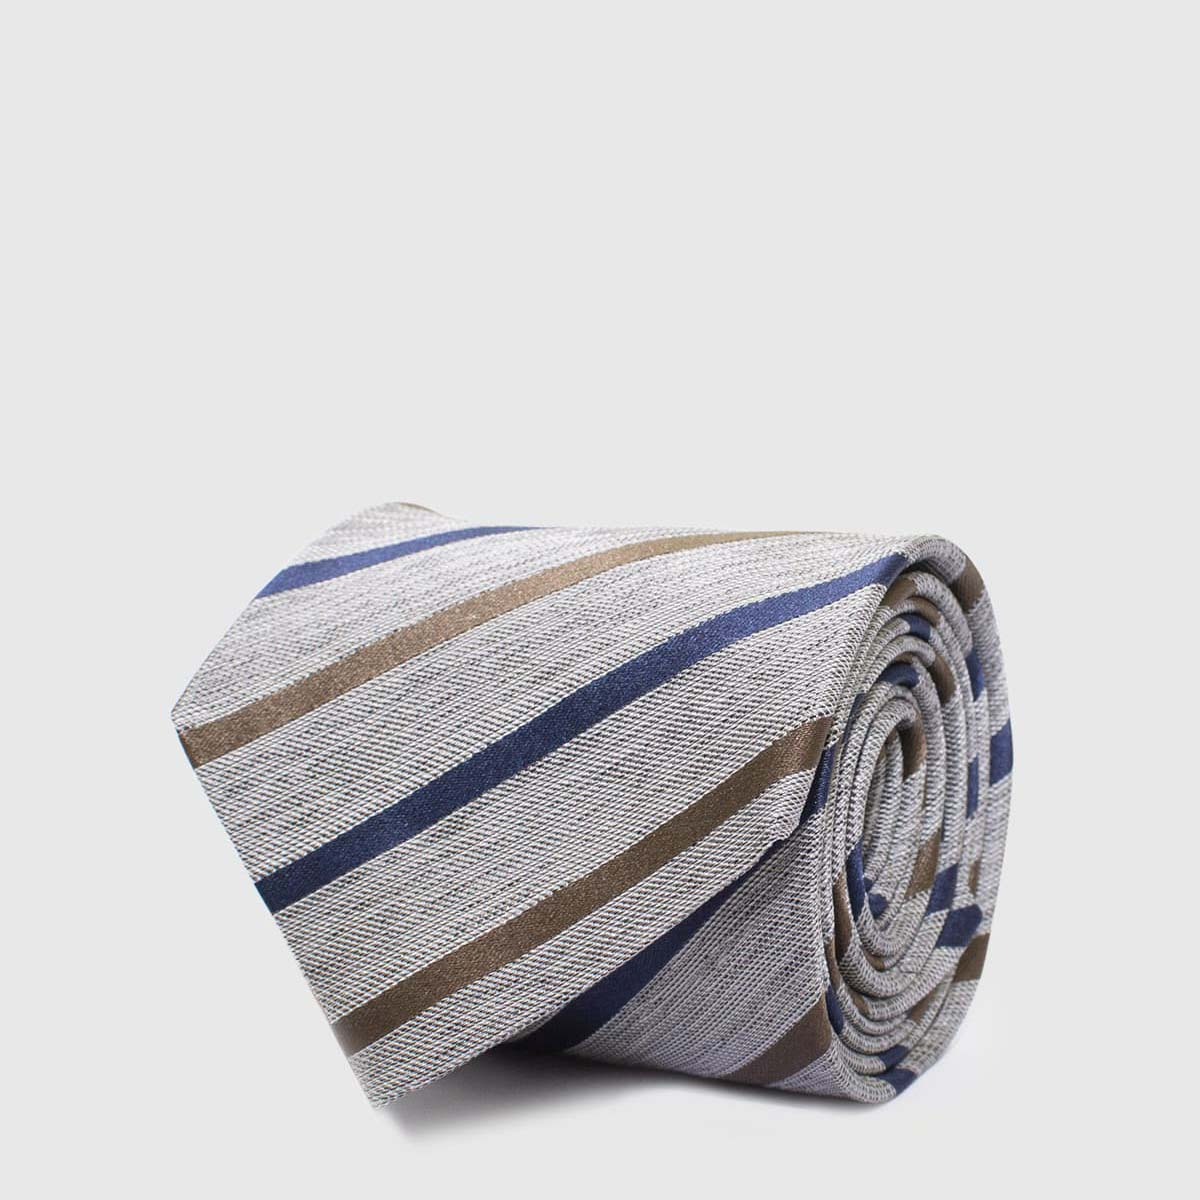 5-Folds Grey striped Tie on a beige background